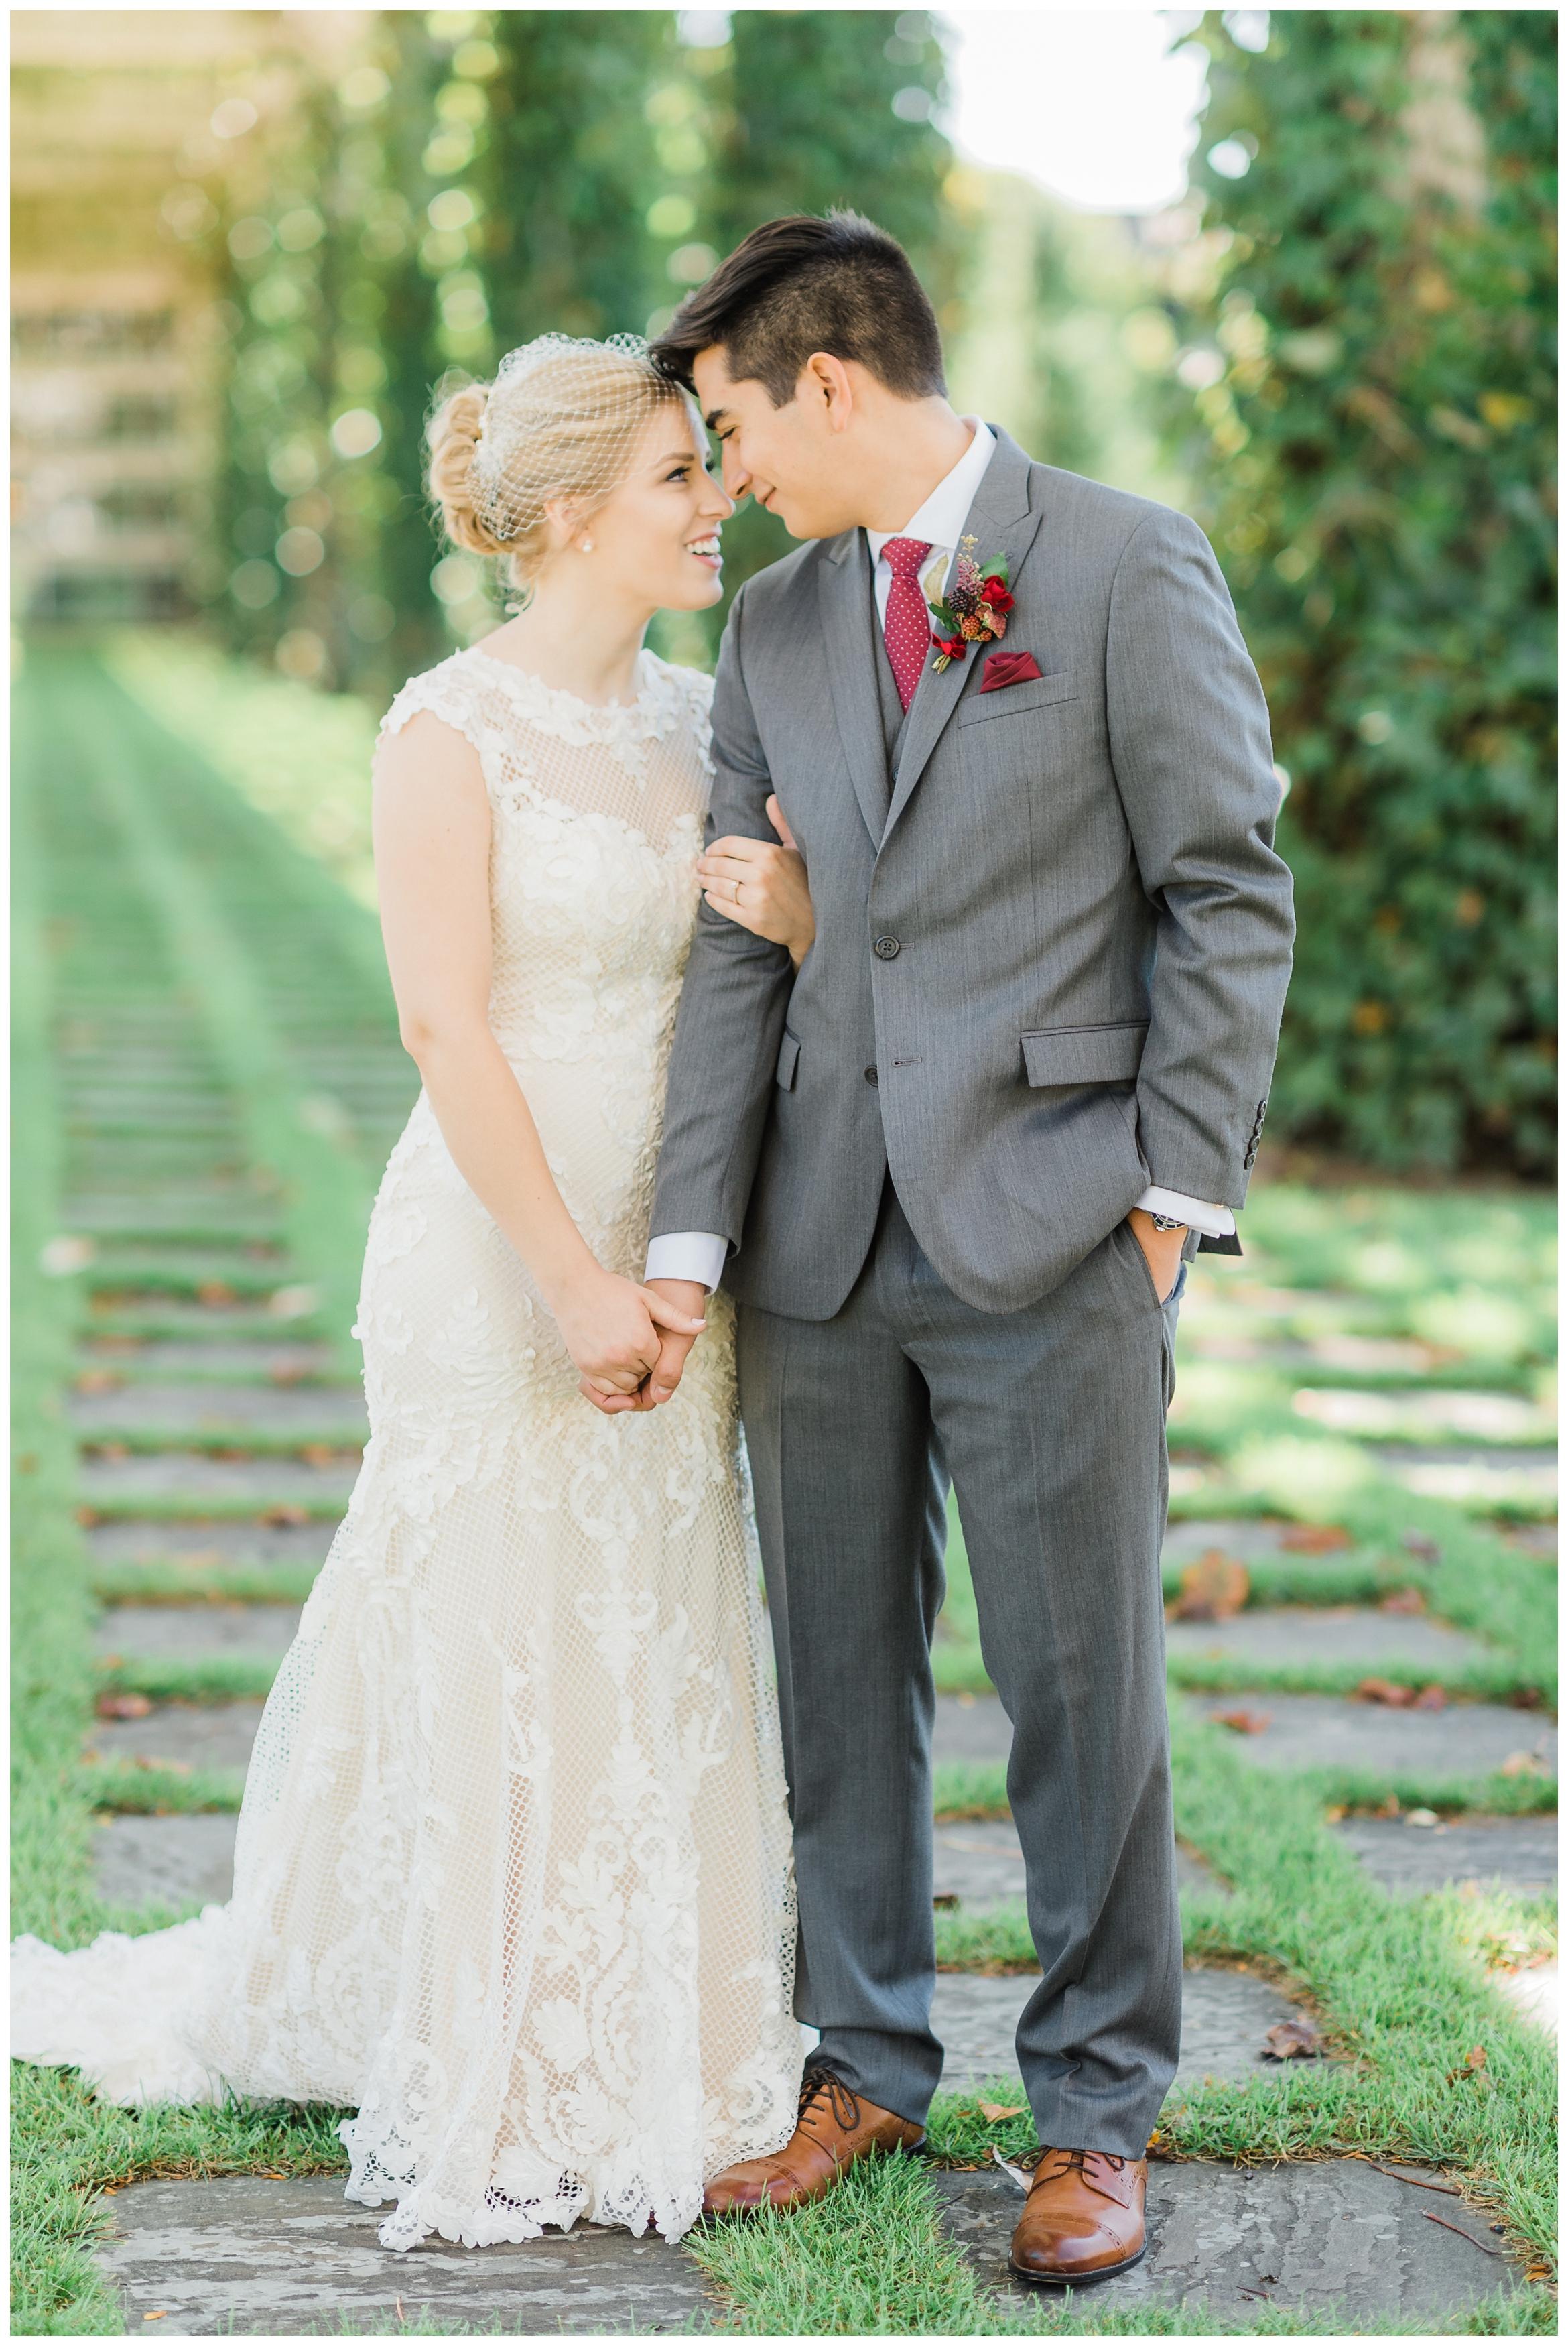 Rebecca_Shehorn_Photography_Indianapolis_Wedding_Photographer_7317.jpg